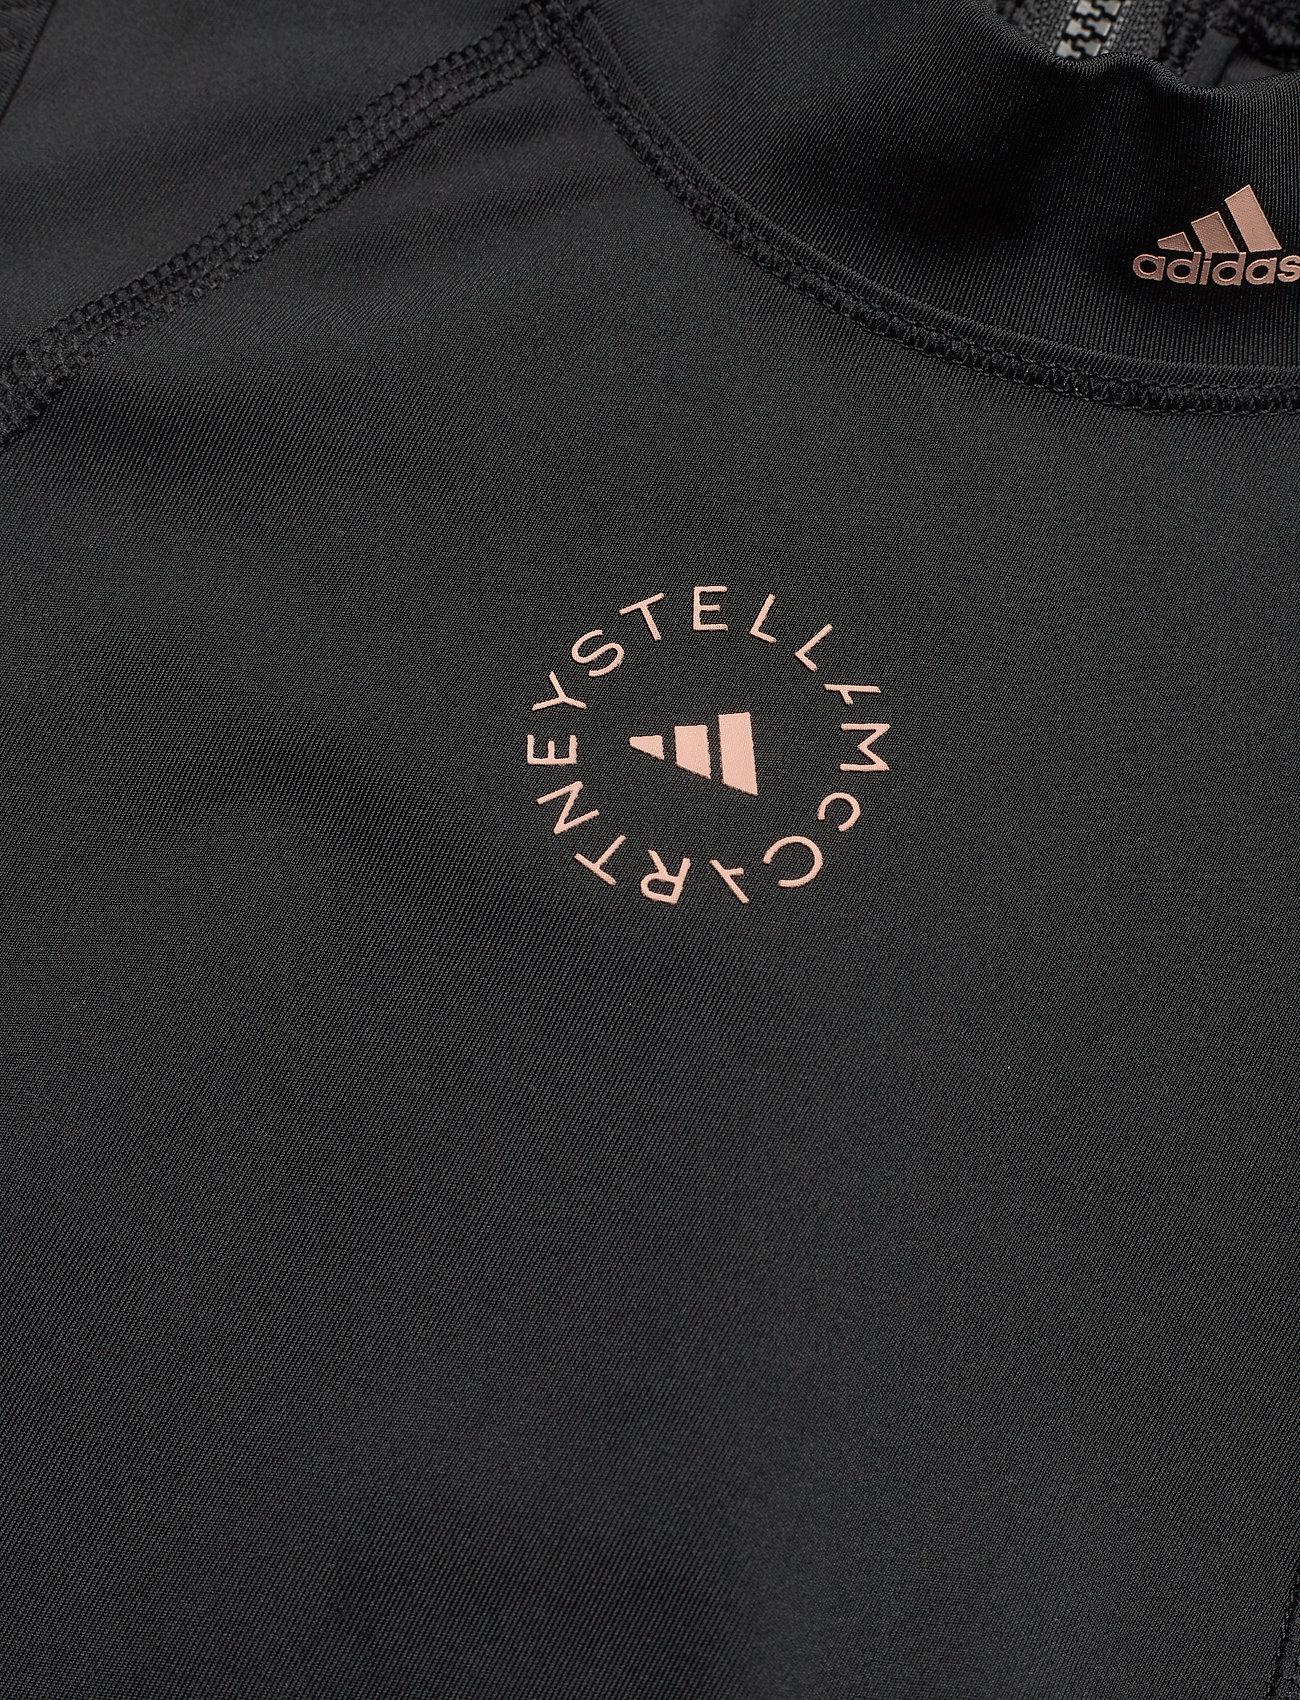 adidas by Stella McCartney - TruePace HEAT.RDY Running Crop Top W - tops & t-shirts - black - 4